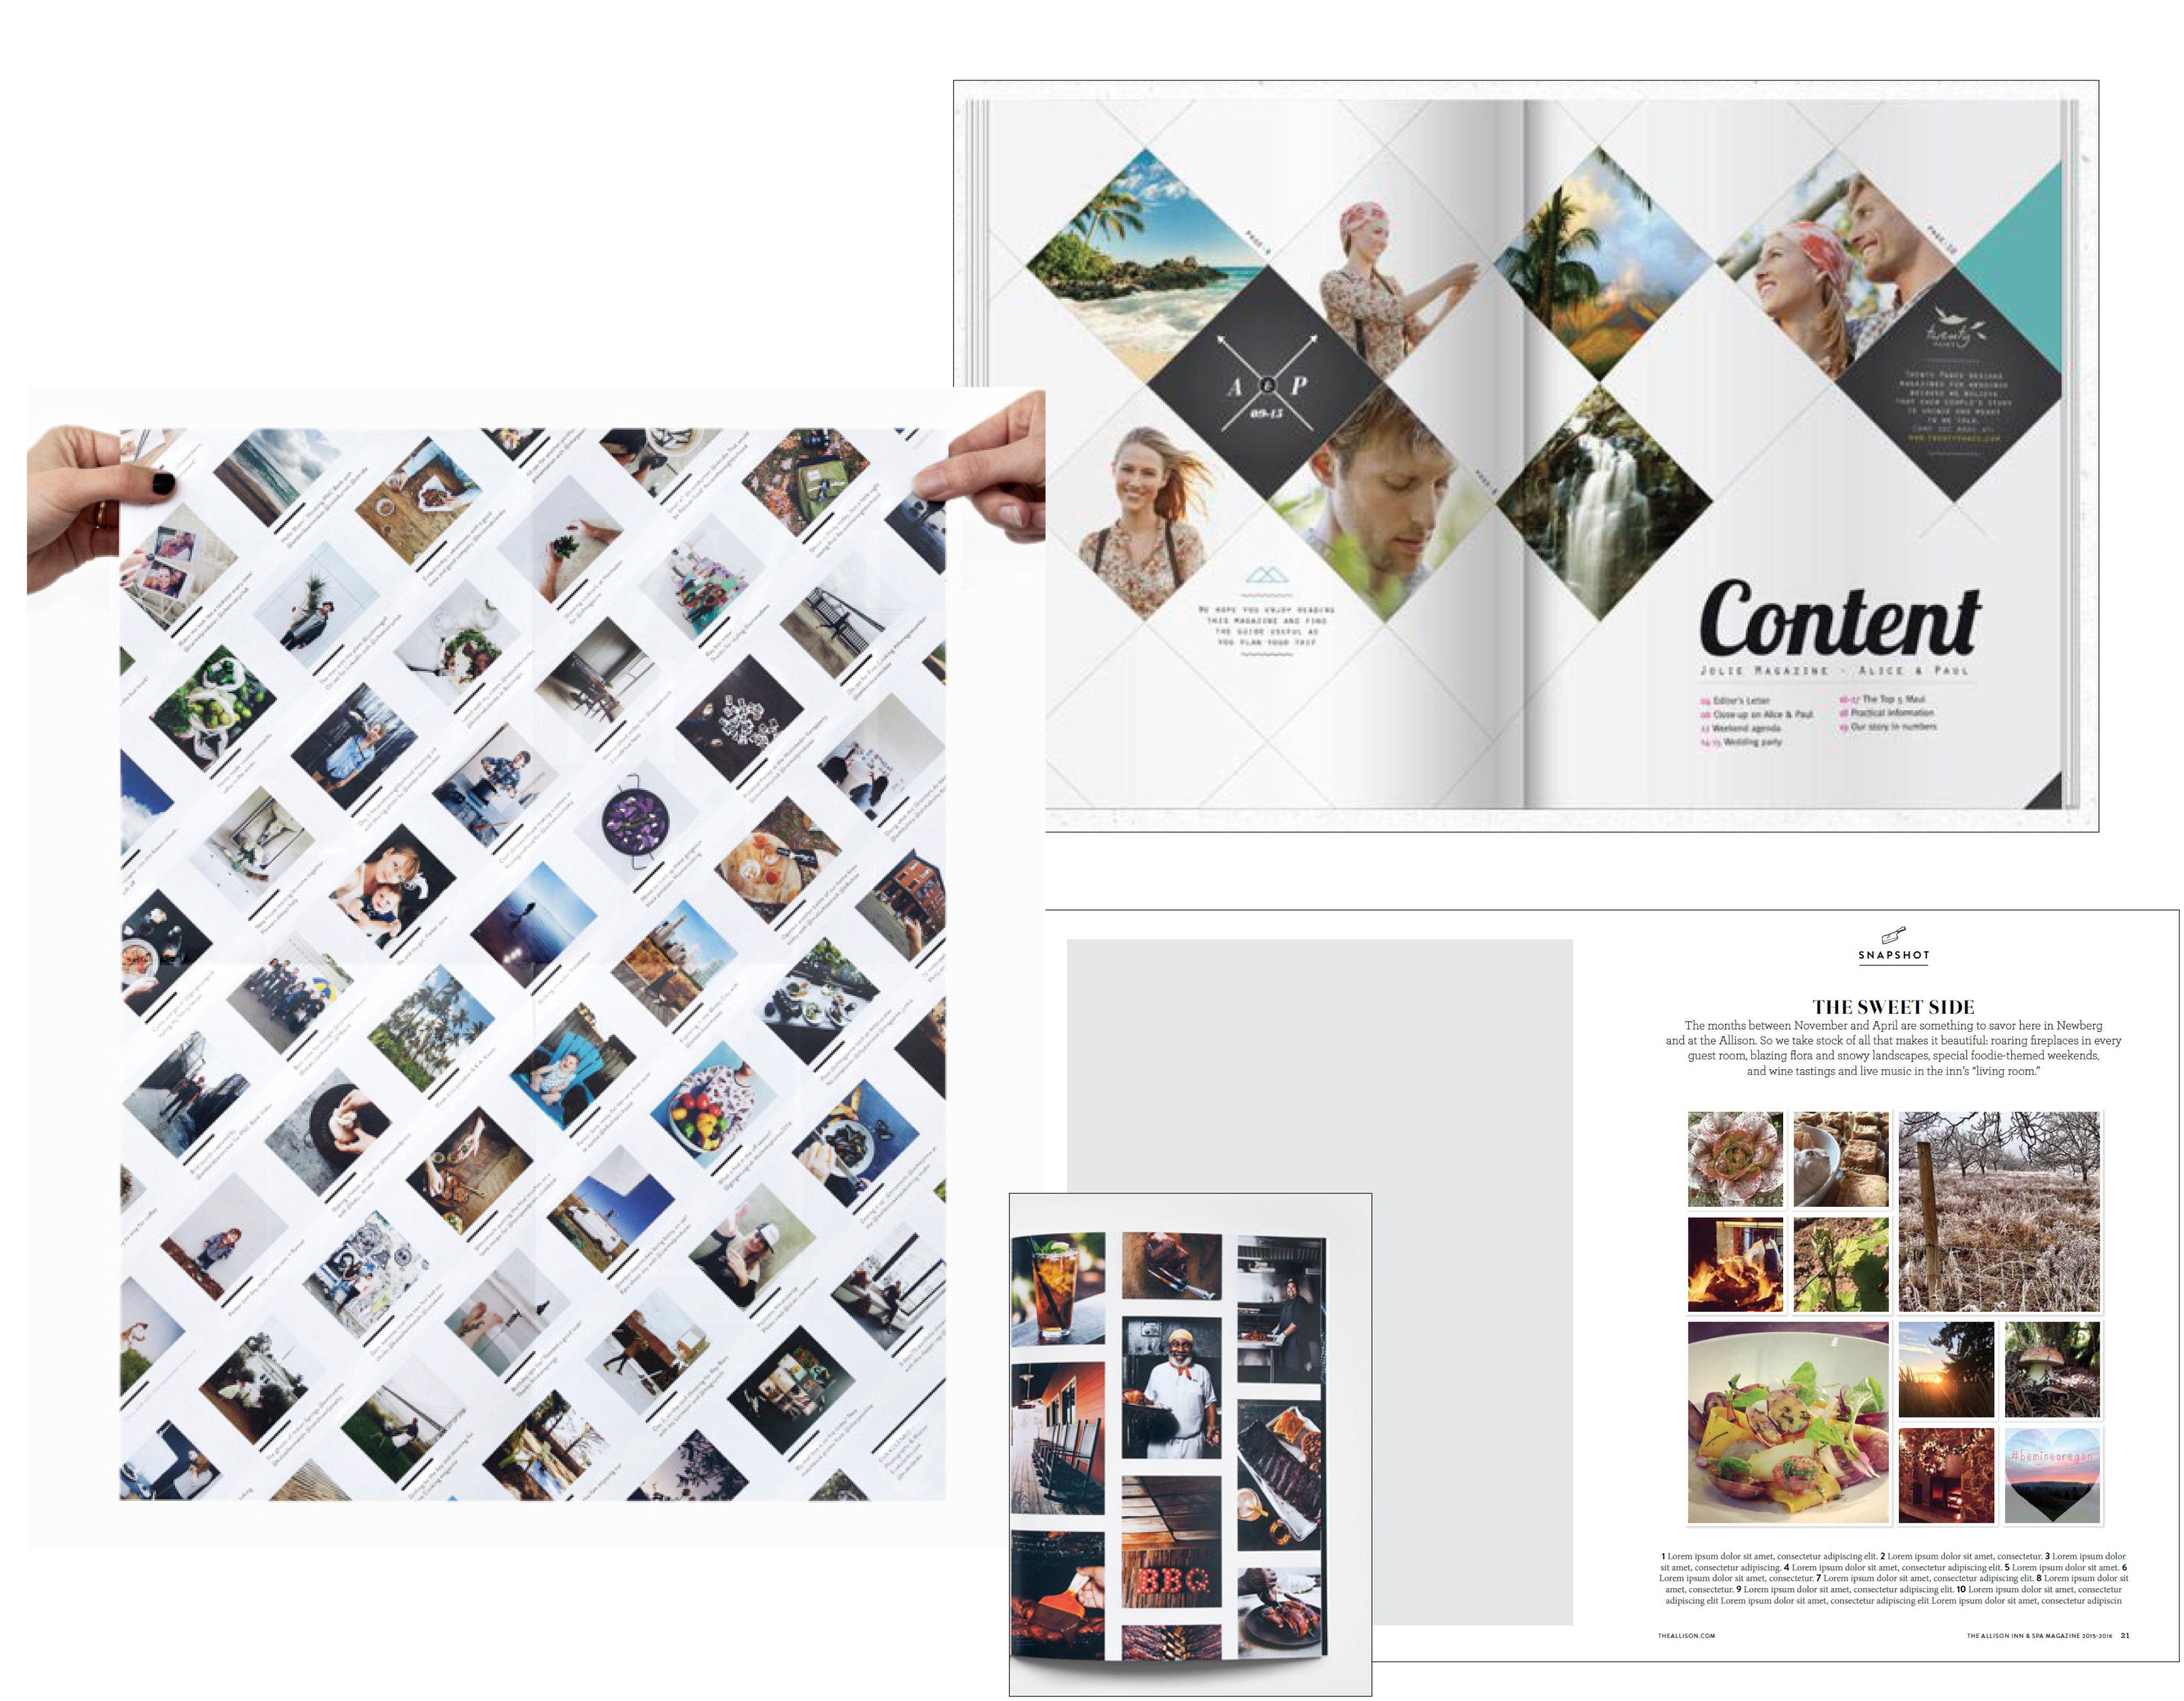 Instagram Collage Design Sample Instagram Collage Design